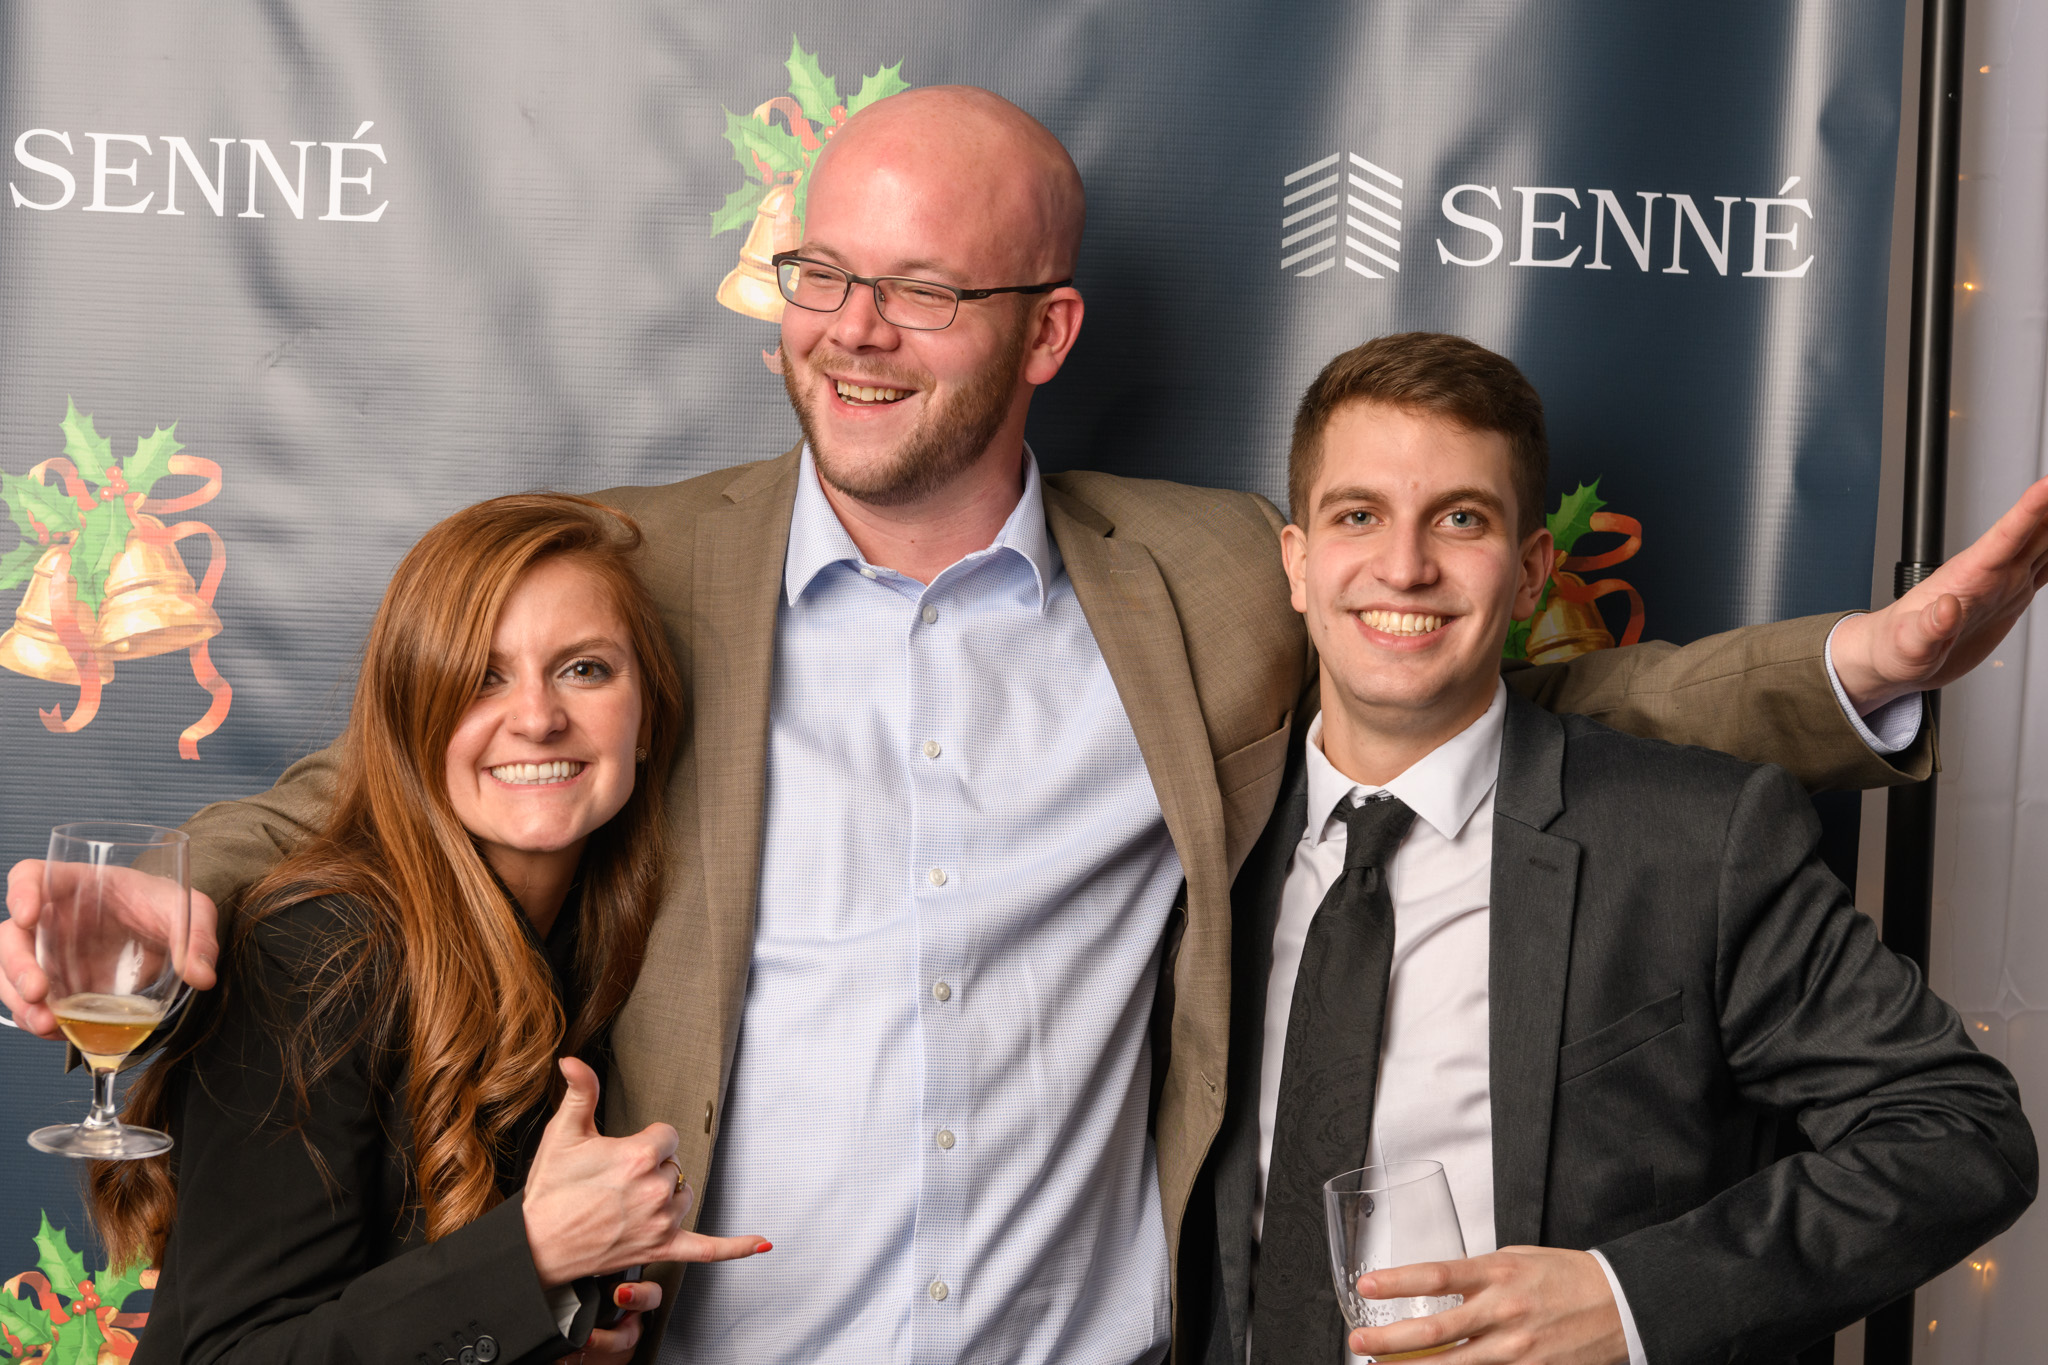 senne-winter-party-2018--0174.jpg